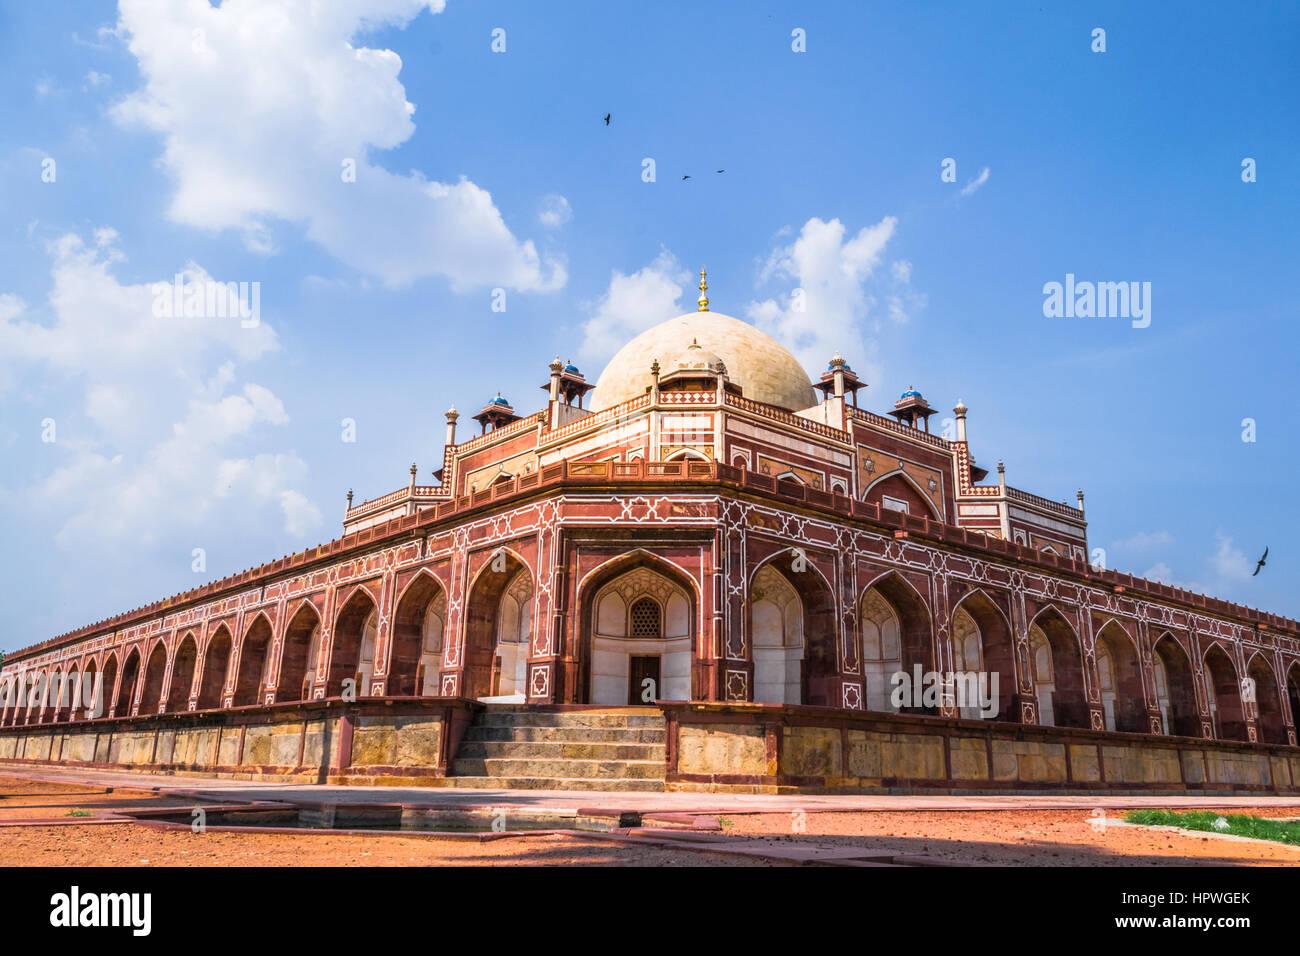 Beautiful view of Humayun's Tomb,  UNESCO World Heritage Centre, Delhi - Stock Image